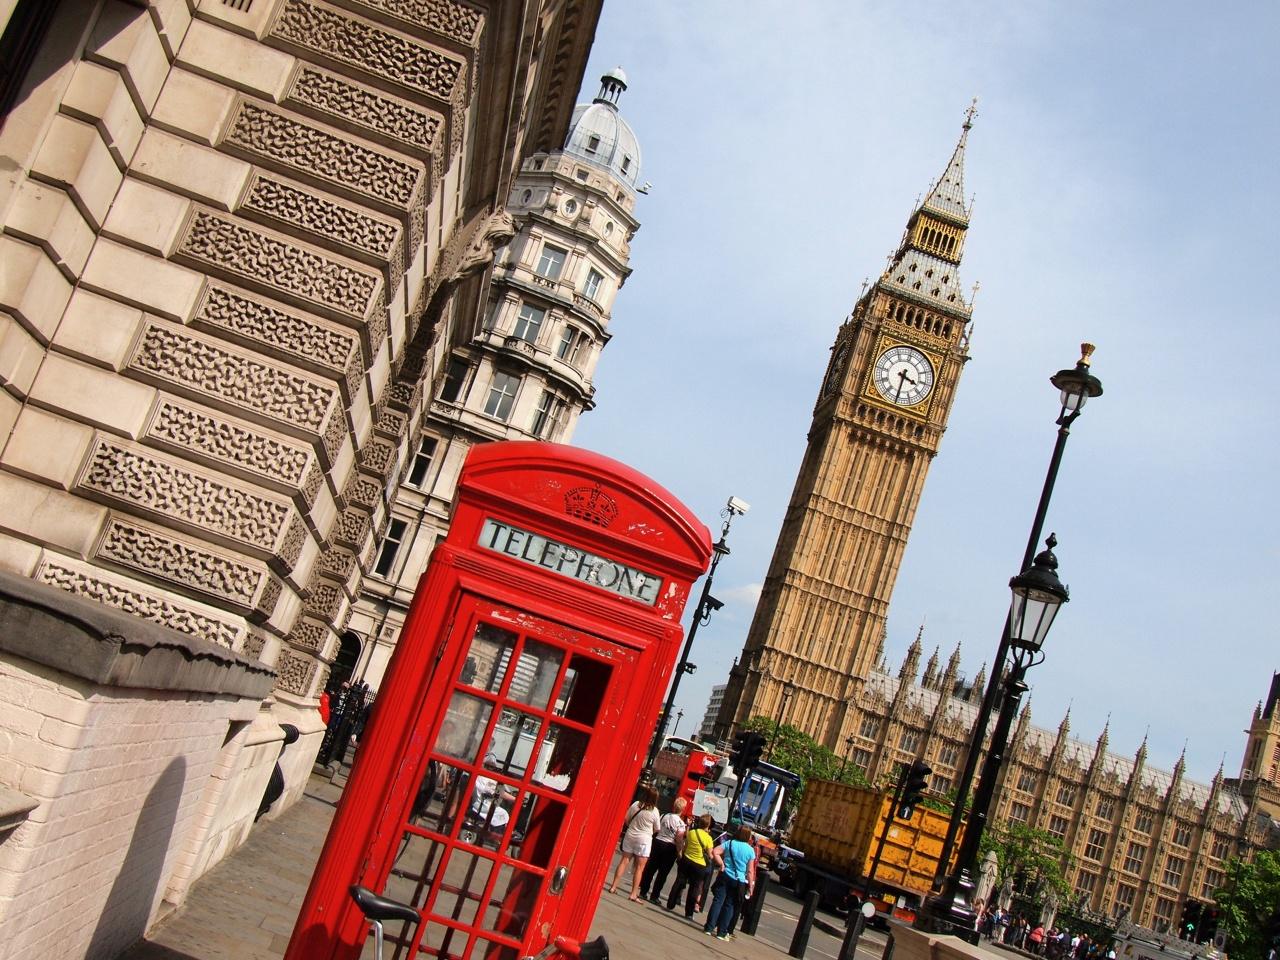 Using a London Pass